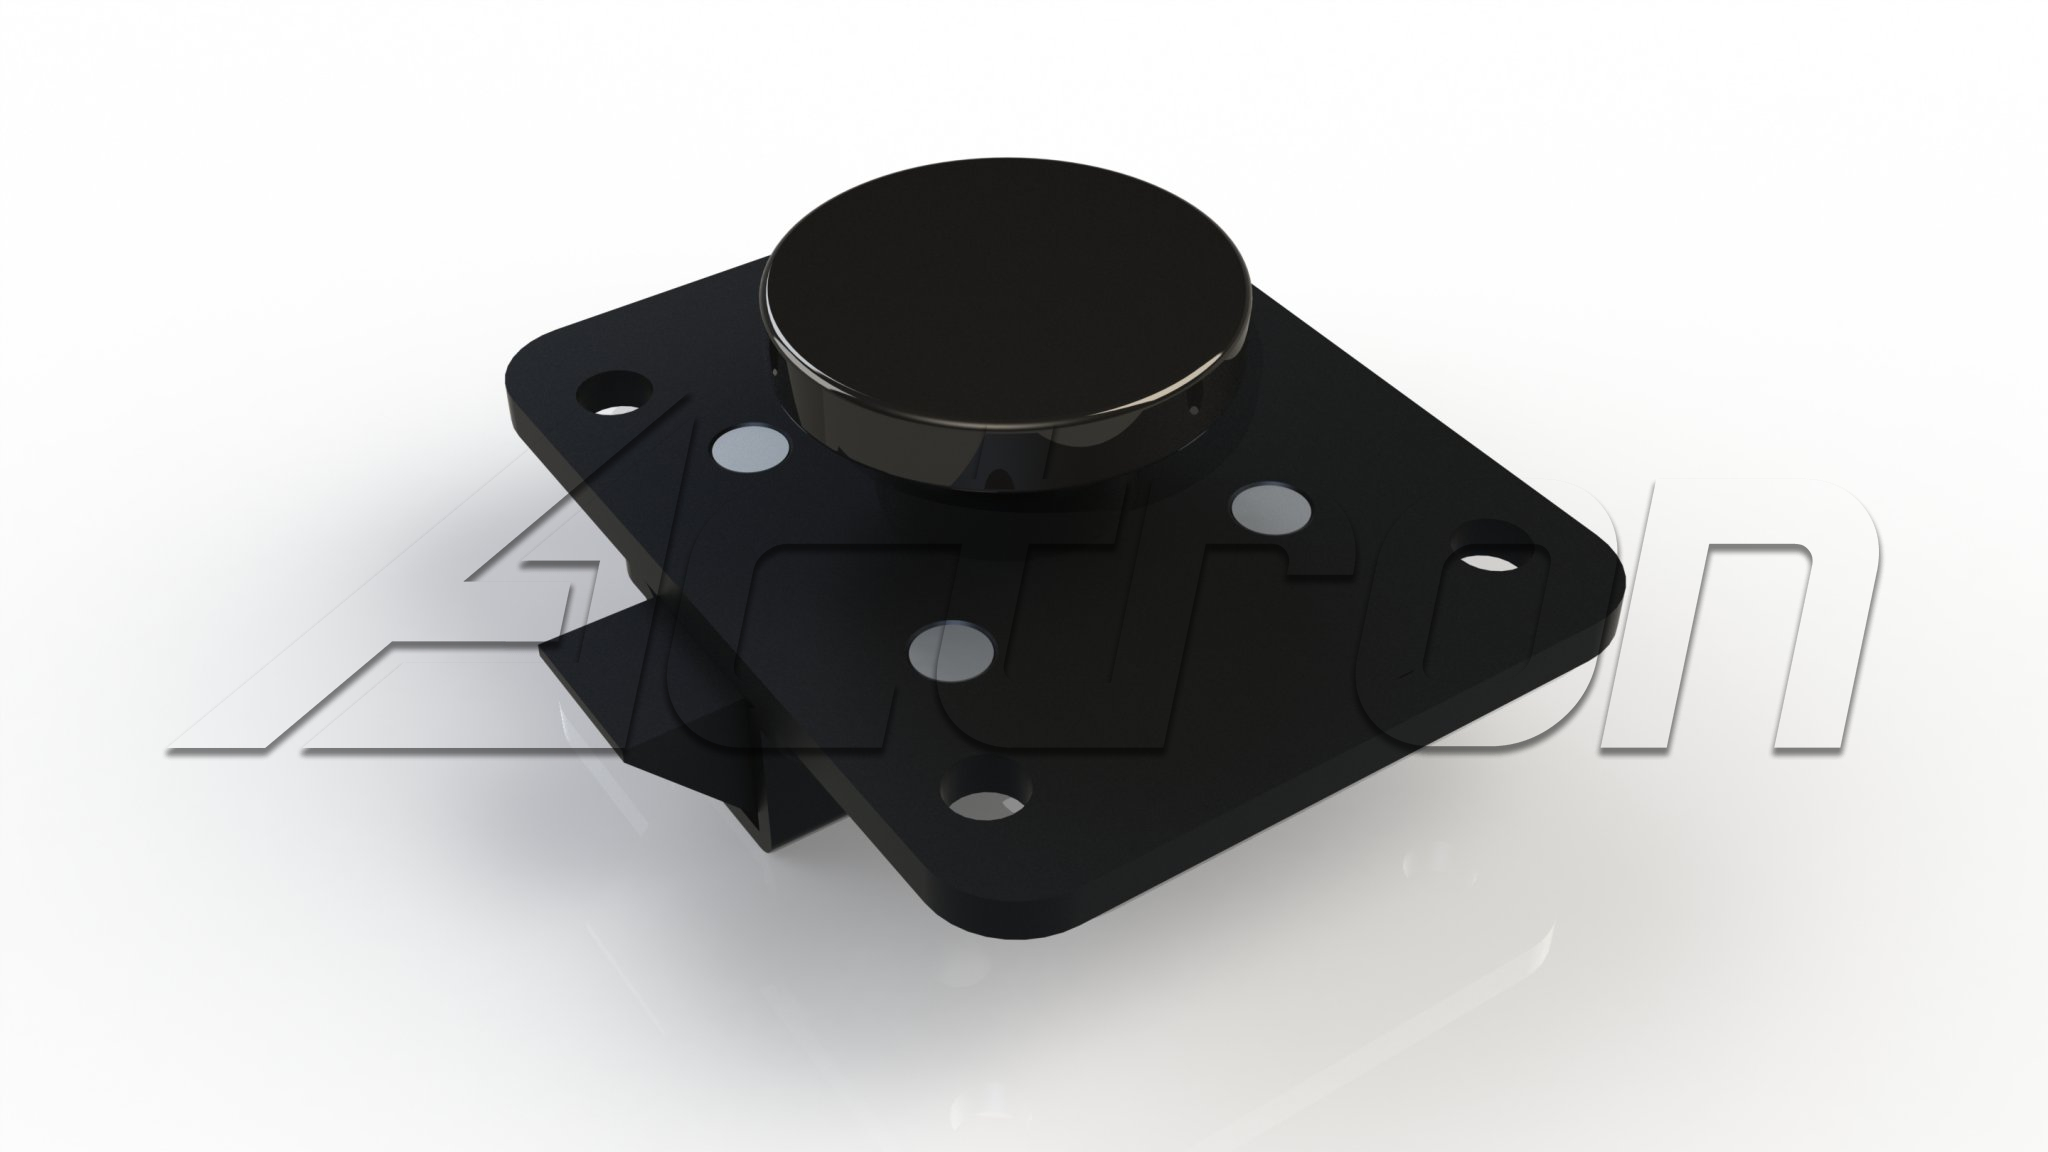 latch-assy-8211-push-button-5516-a30012.jpg